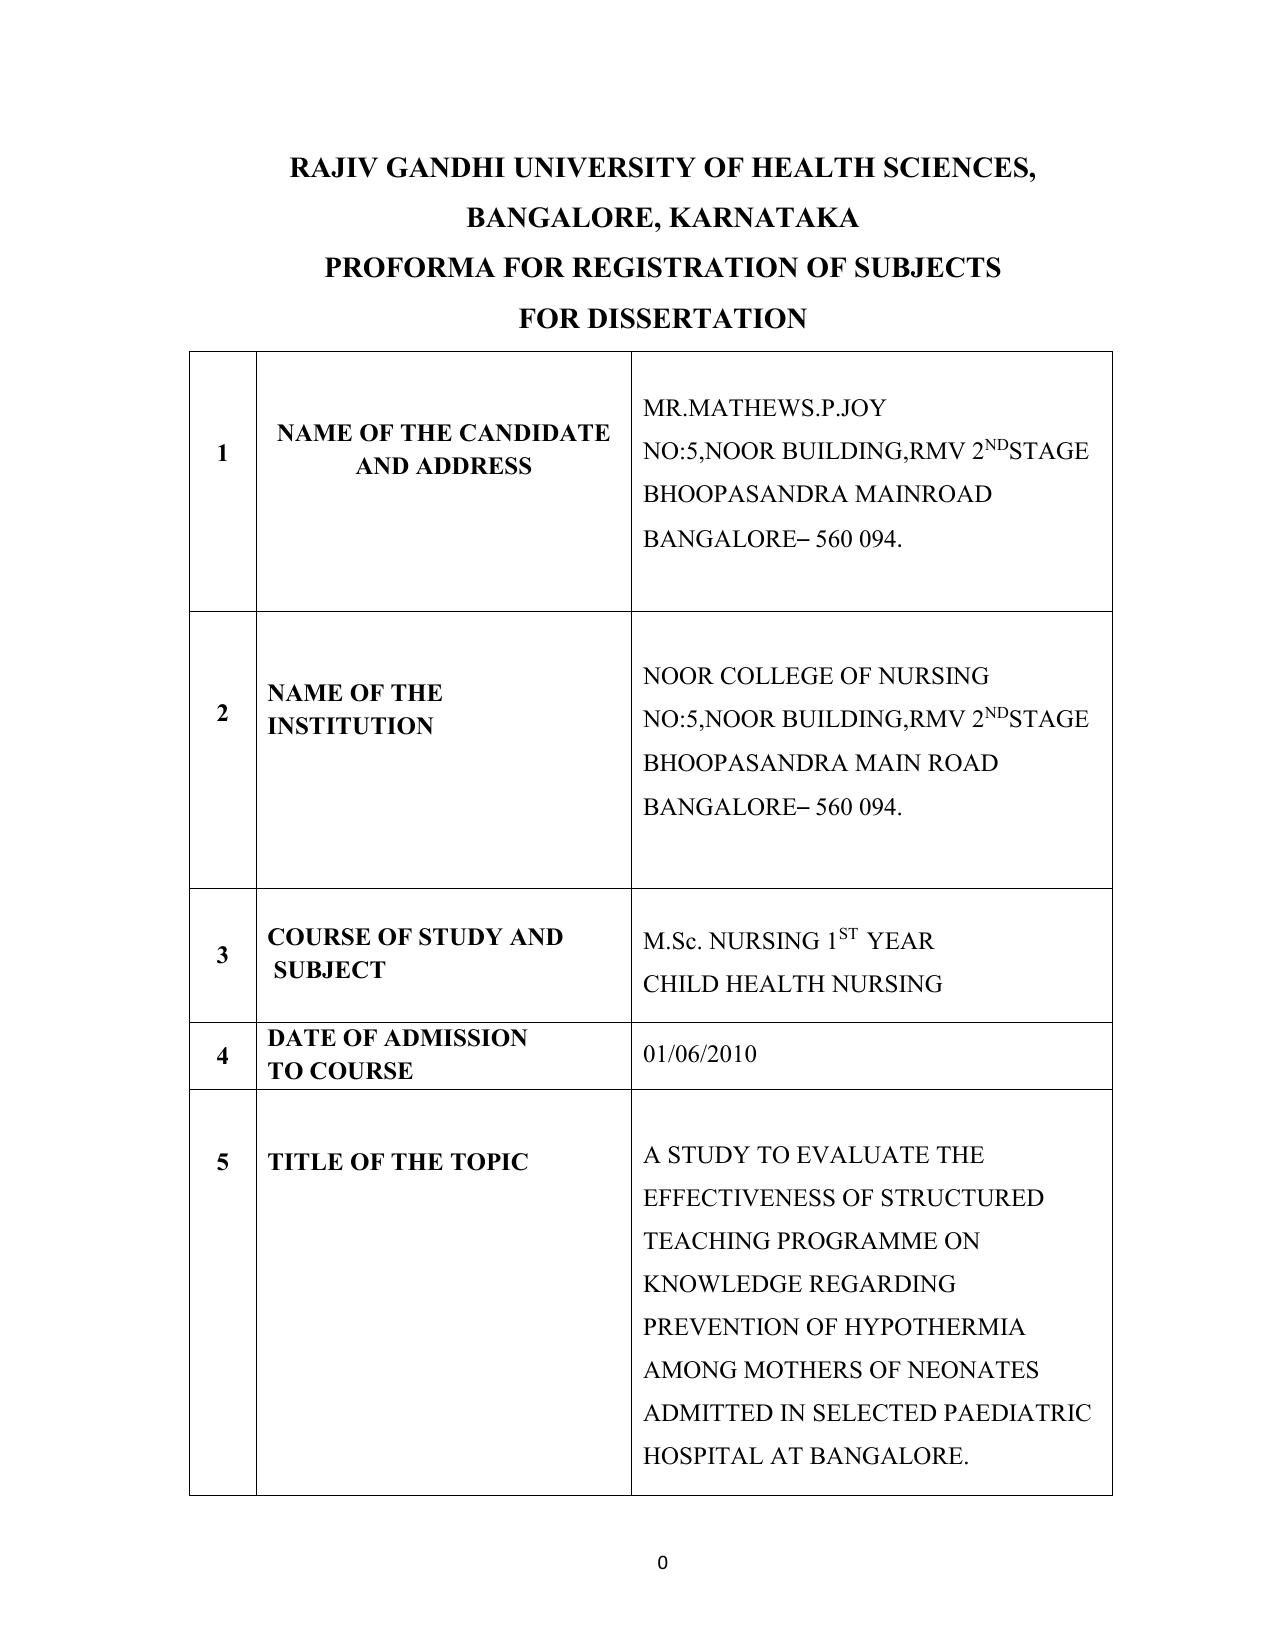 dissertation proforma rguhs